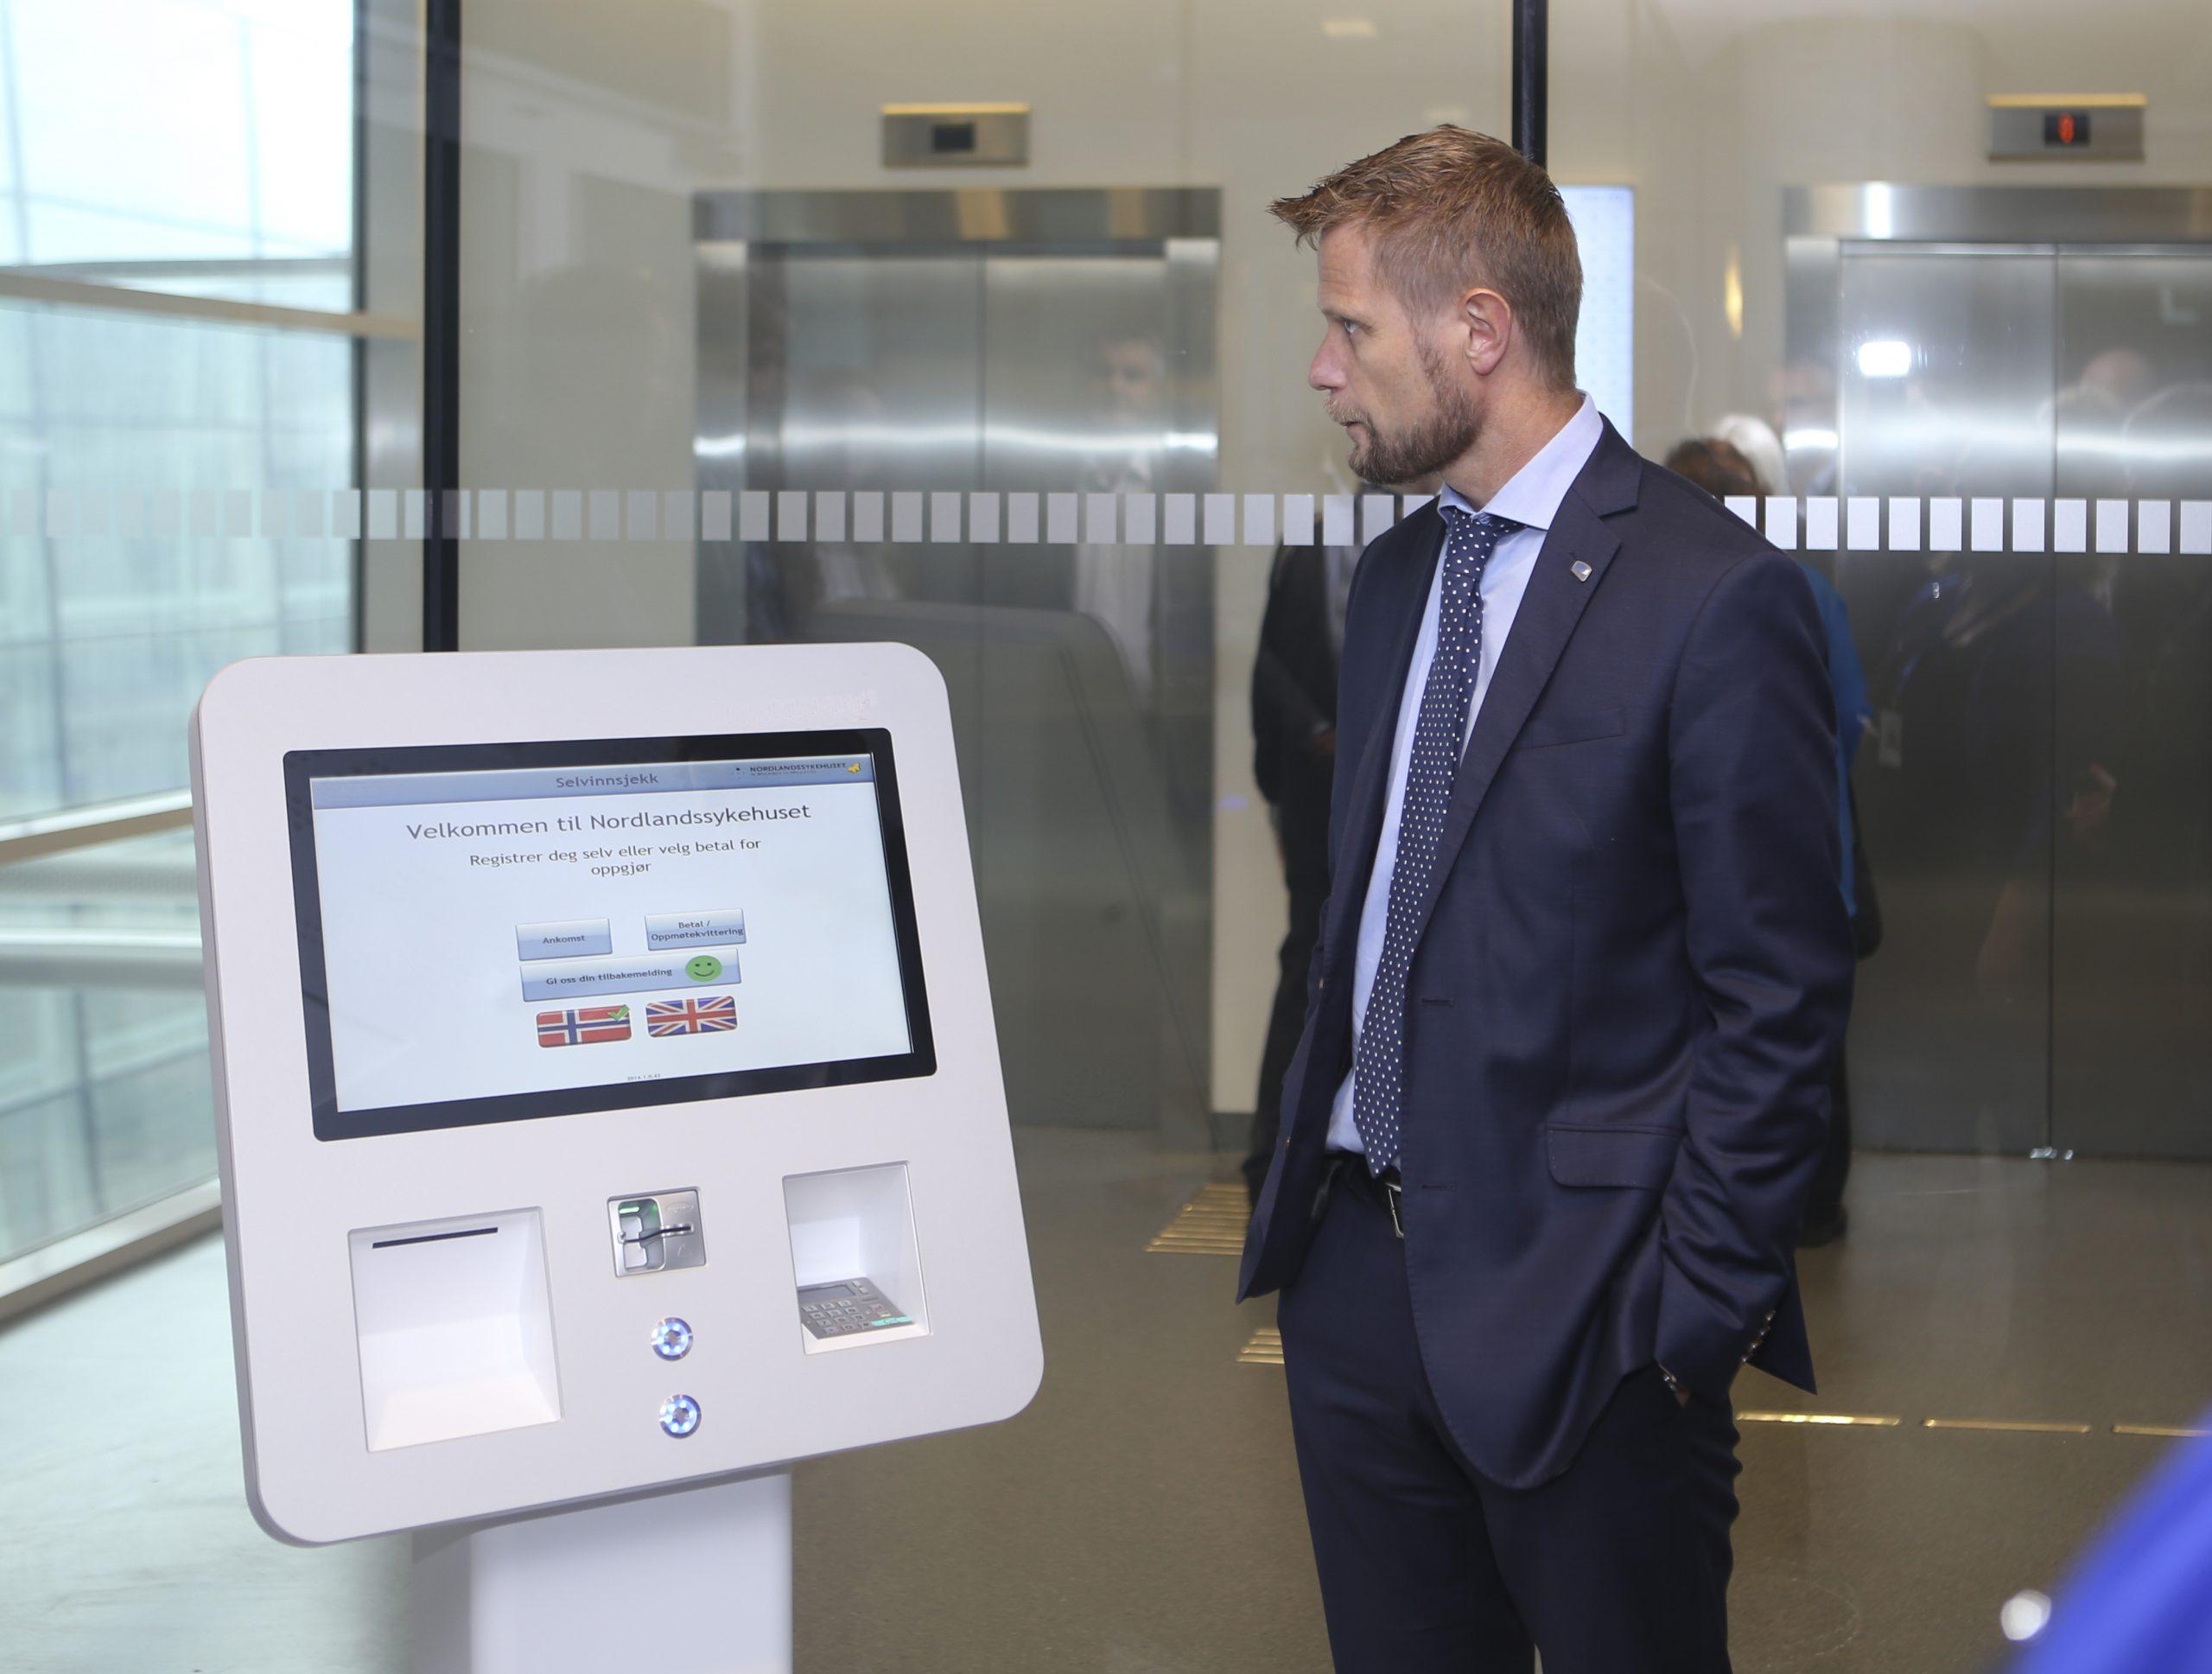 Procon Pasientkiosk - Helseminister Bent Høie